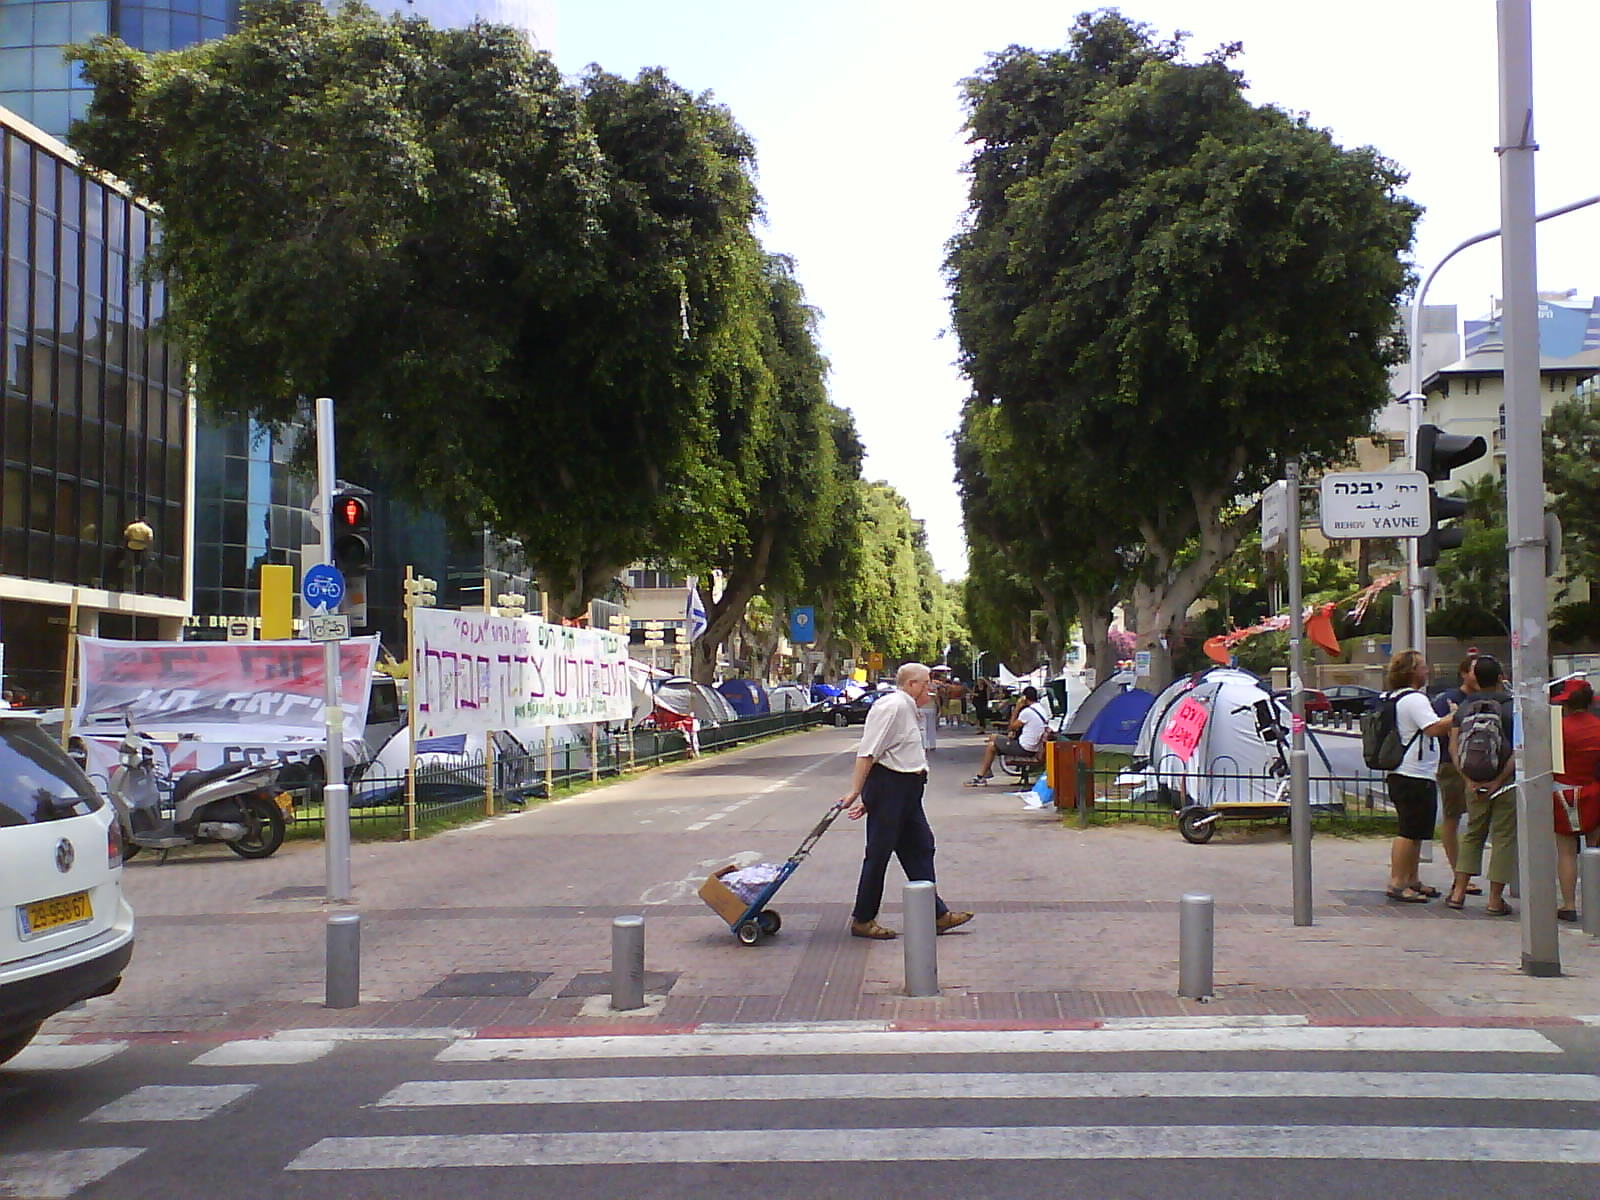 Tel Aviv Update: Shearim: Photo Update: Tel Aviv's Tent Demonstration At